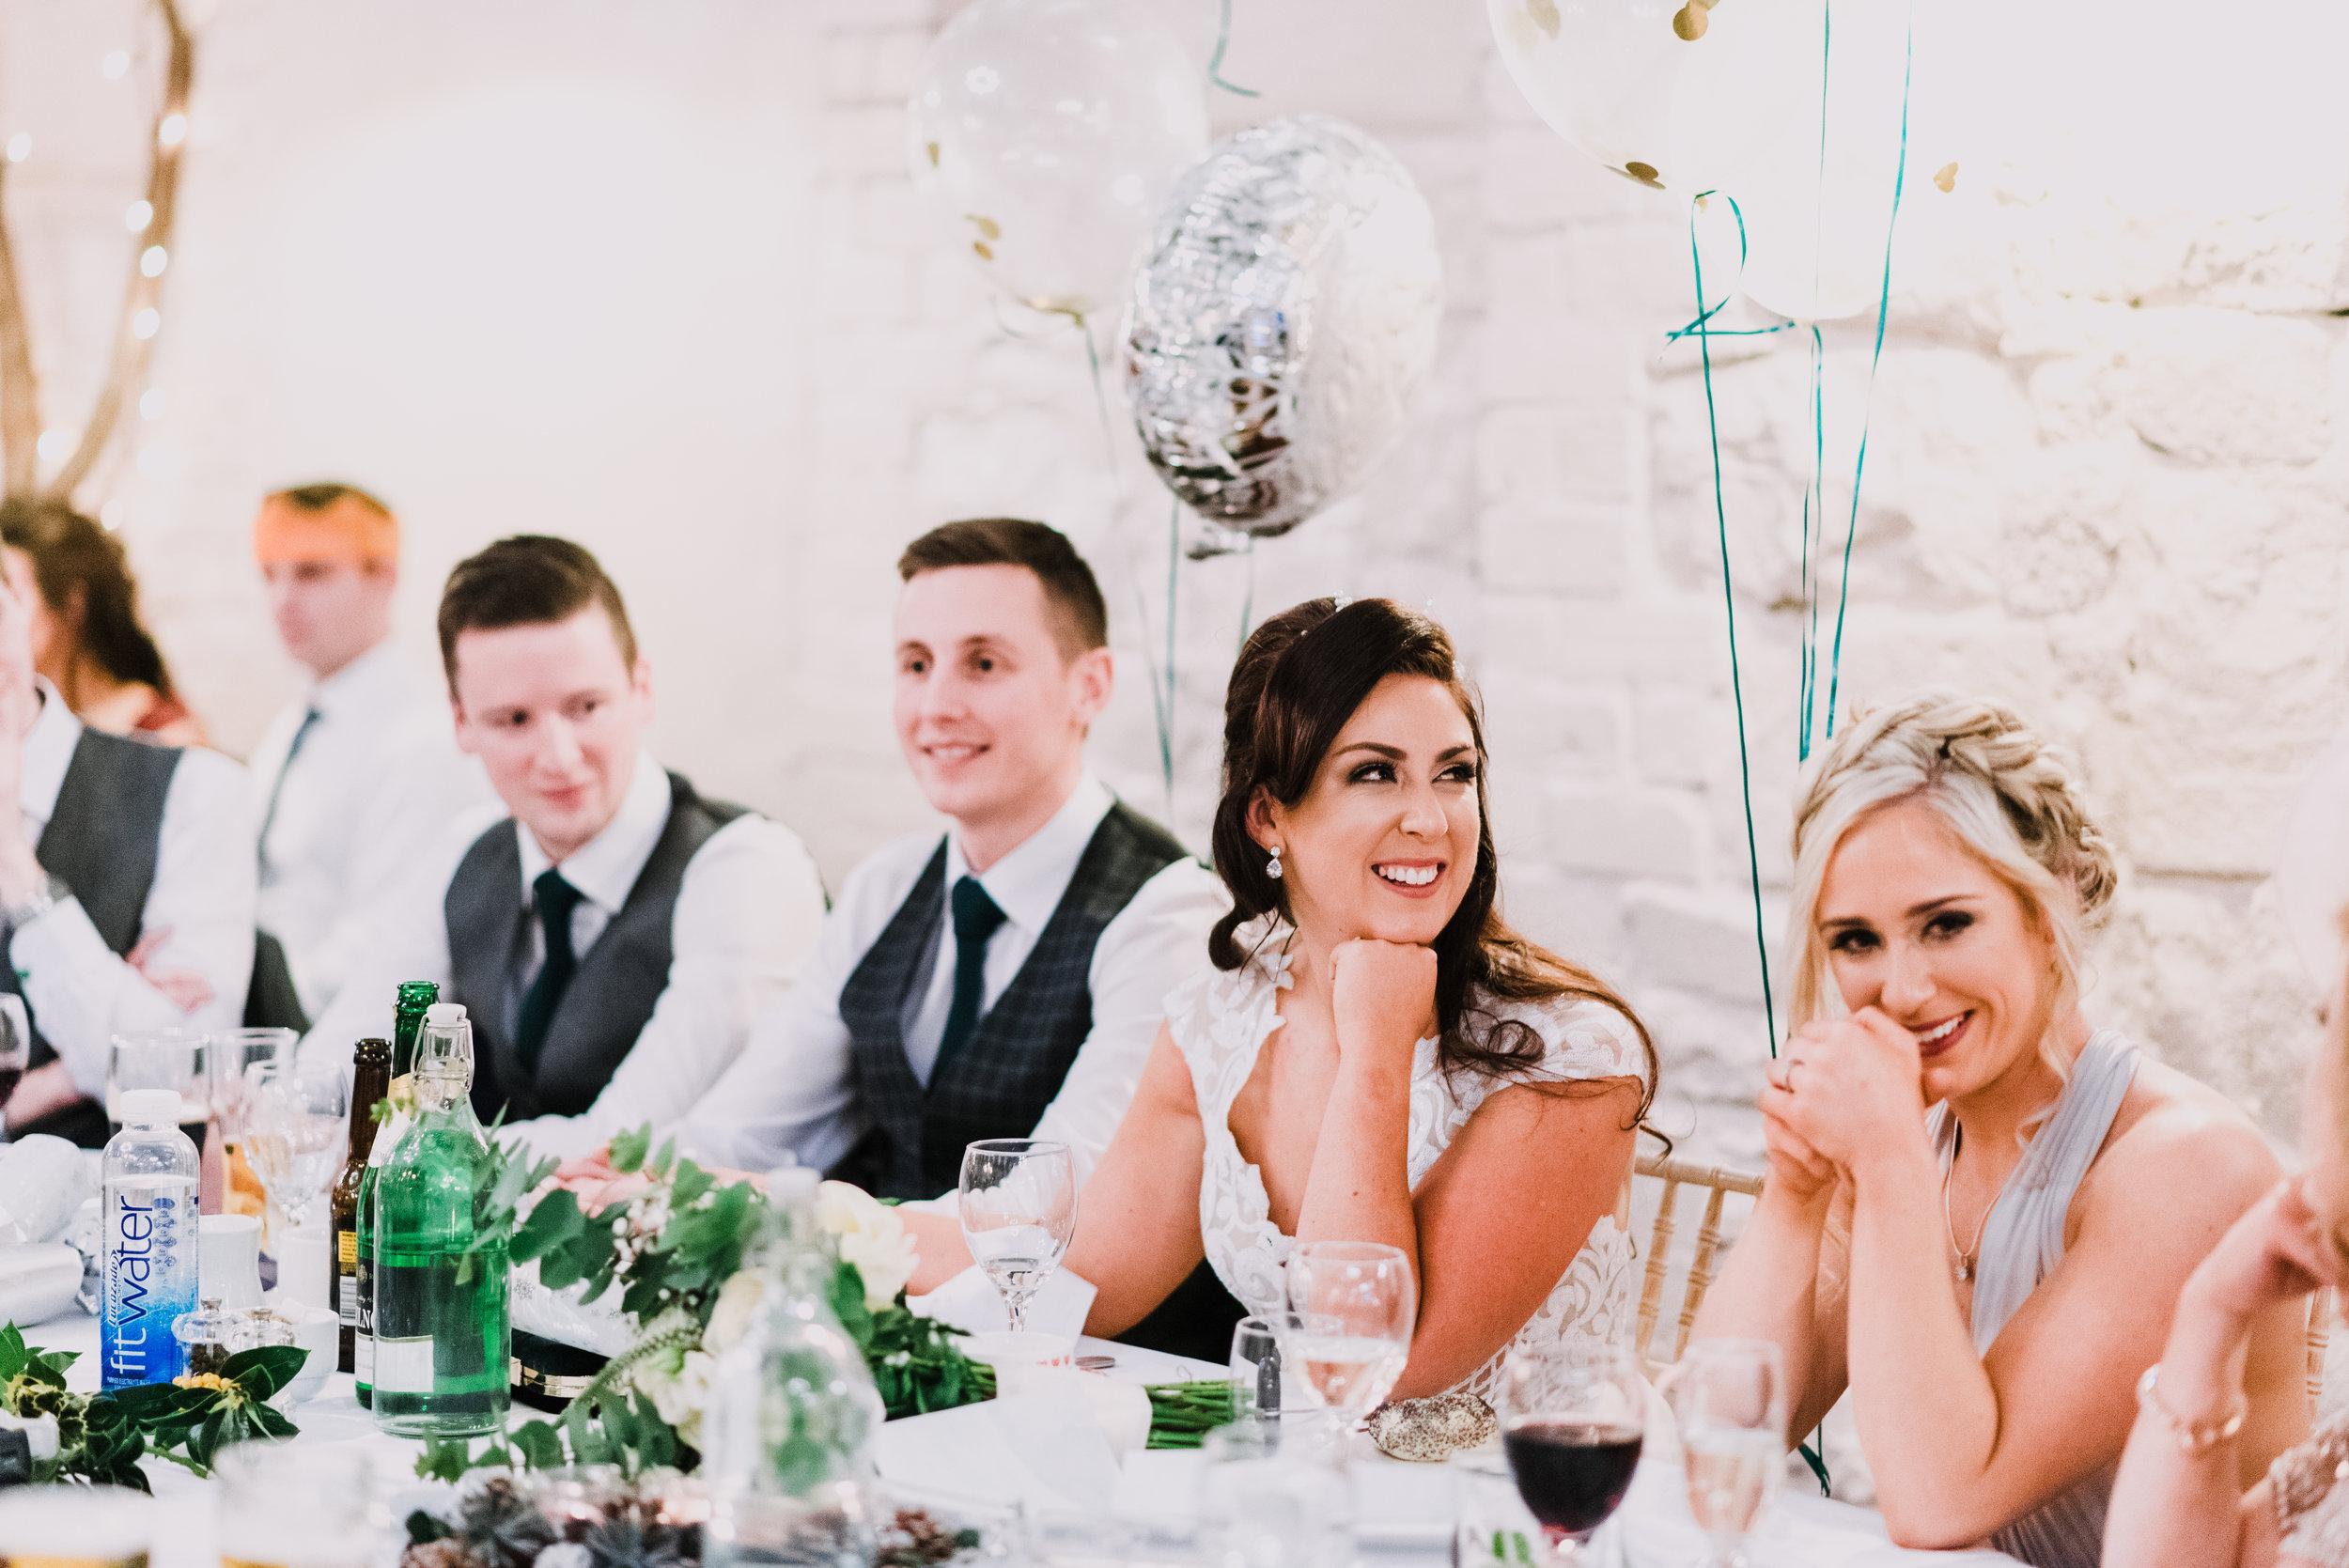 larchfield estate wedding, wedding venues northern ireland, barn wedding venues northern ireland, wedding photos larchfield estate, shane todd wedding, larchfield wedding decor ideas (22).jpg